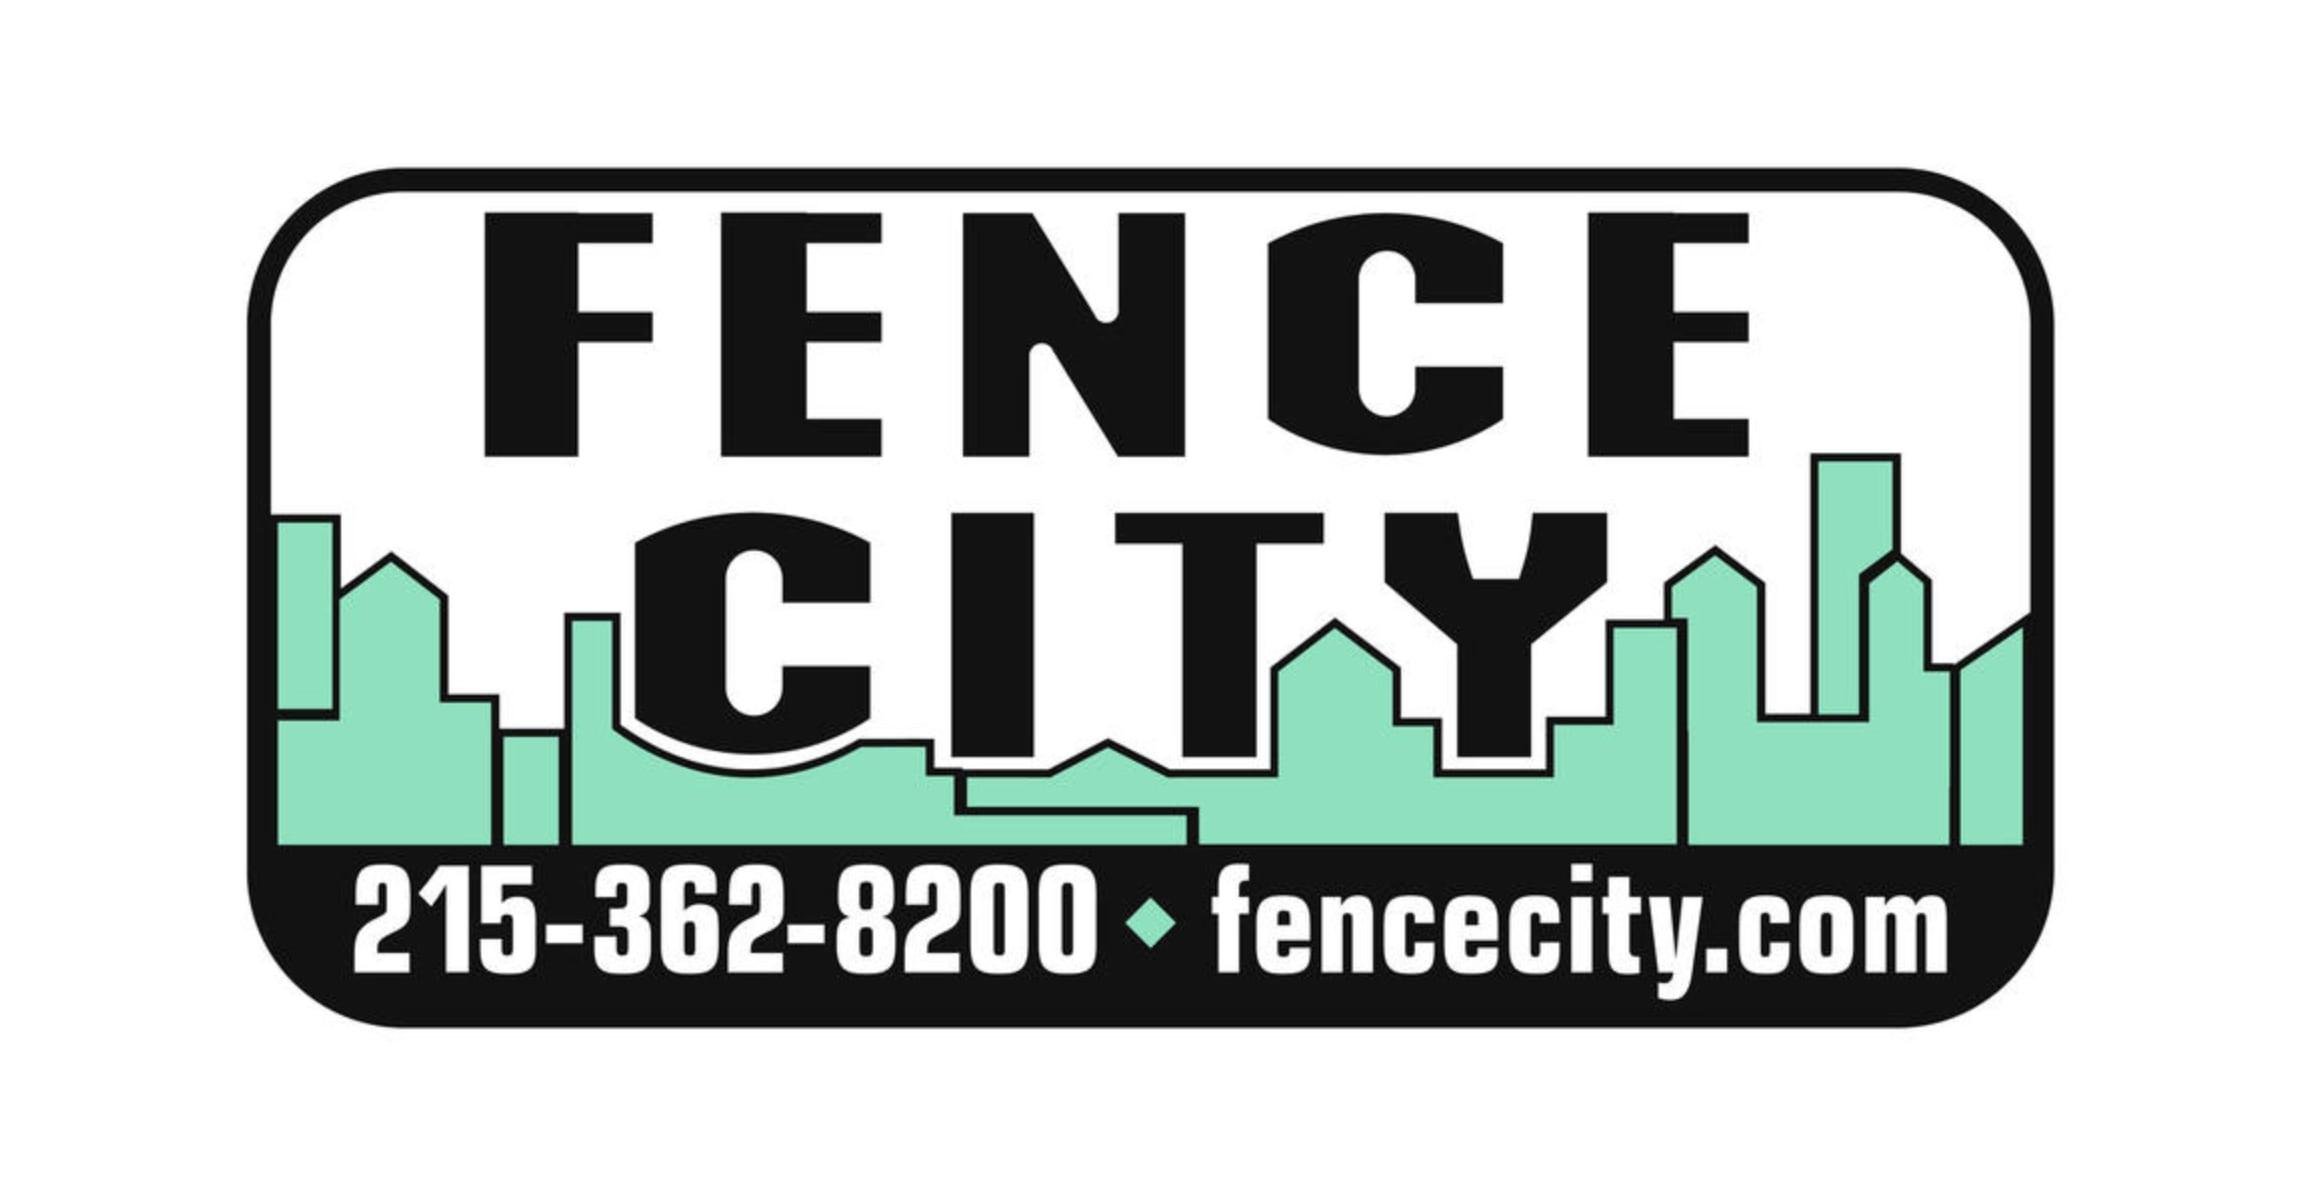 fencecity_logo_wider.jpg